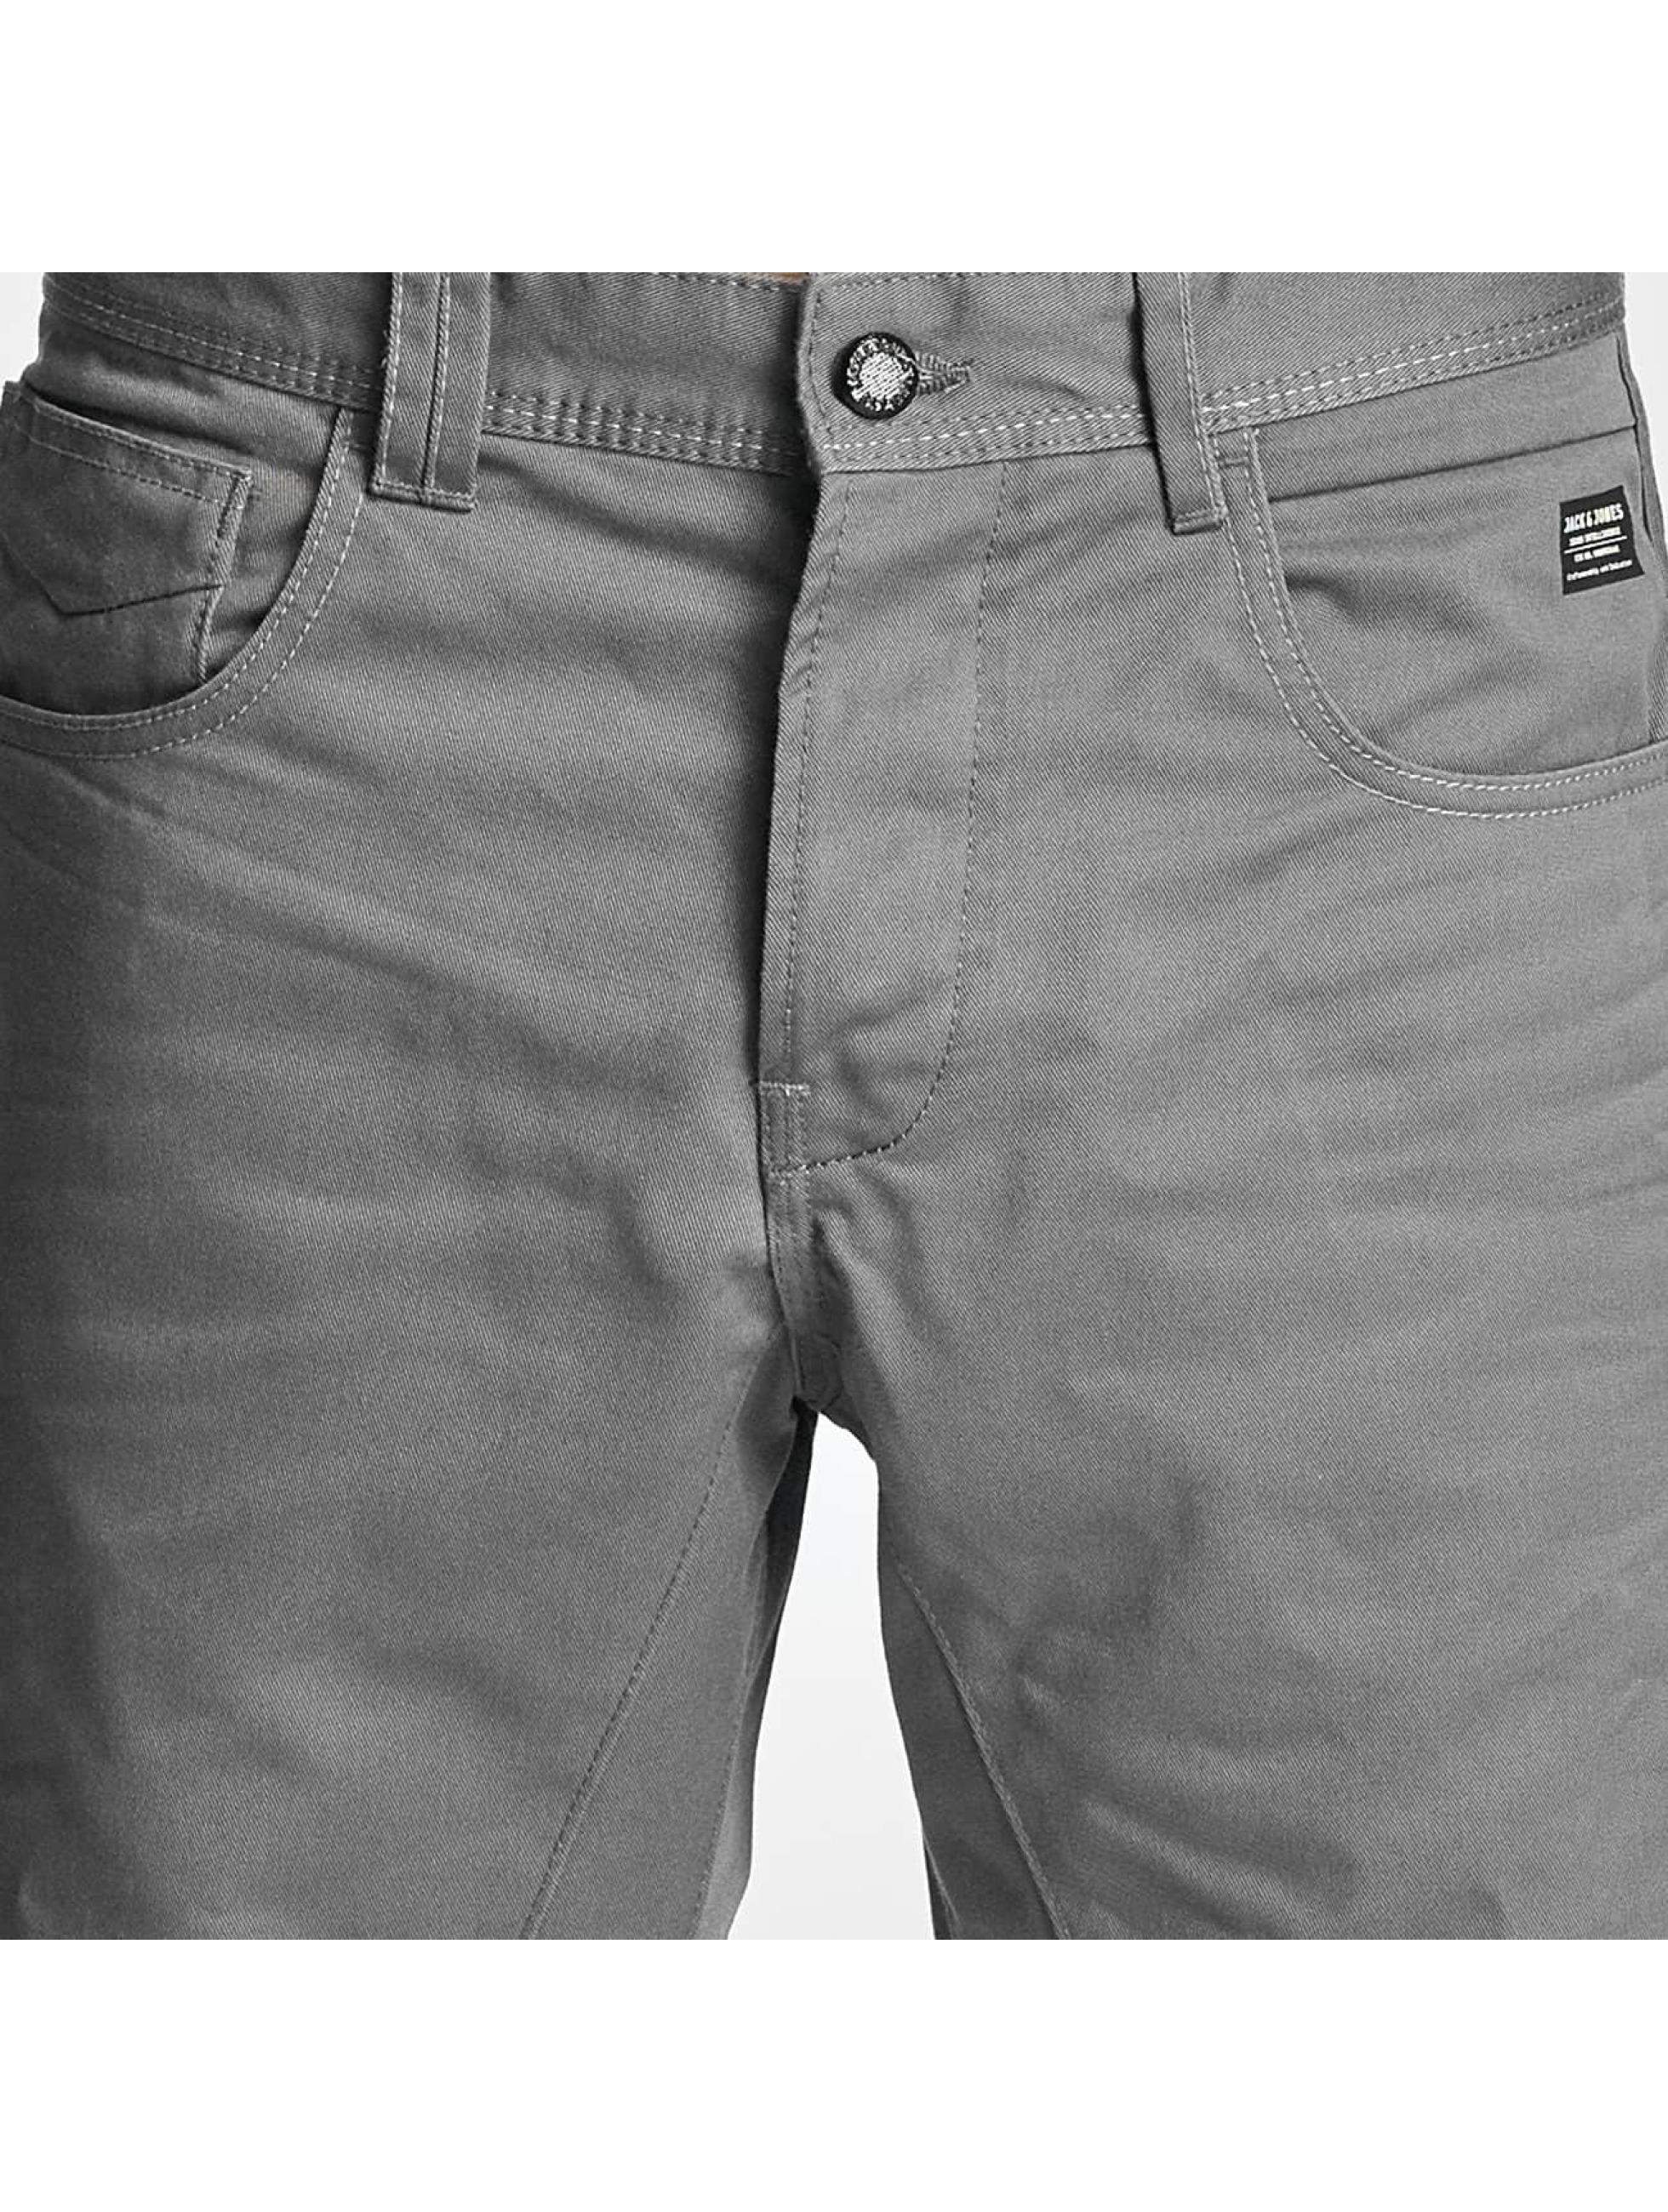 Jack & Jones Short jjiSac grey